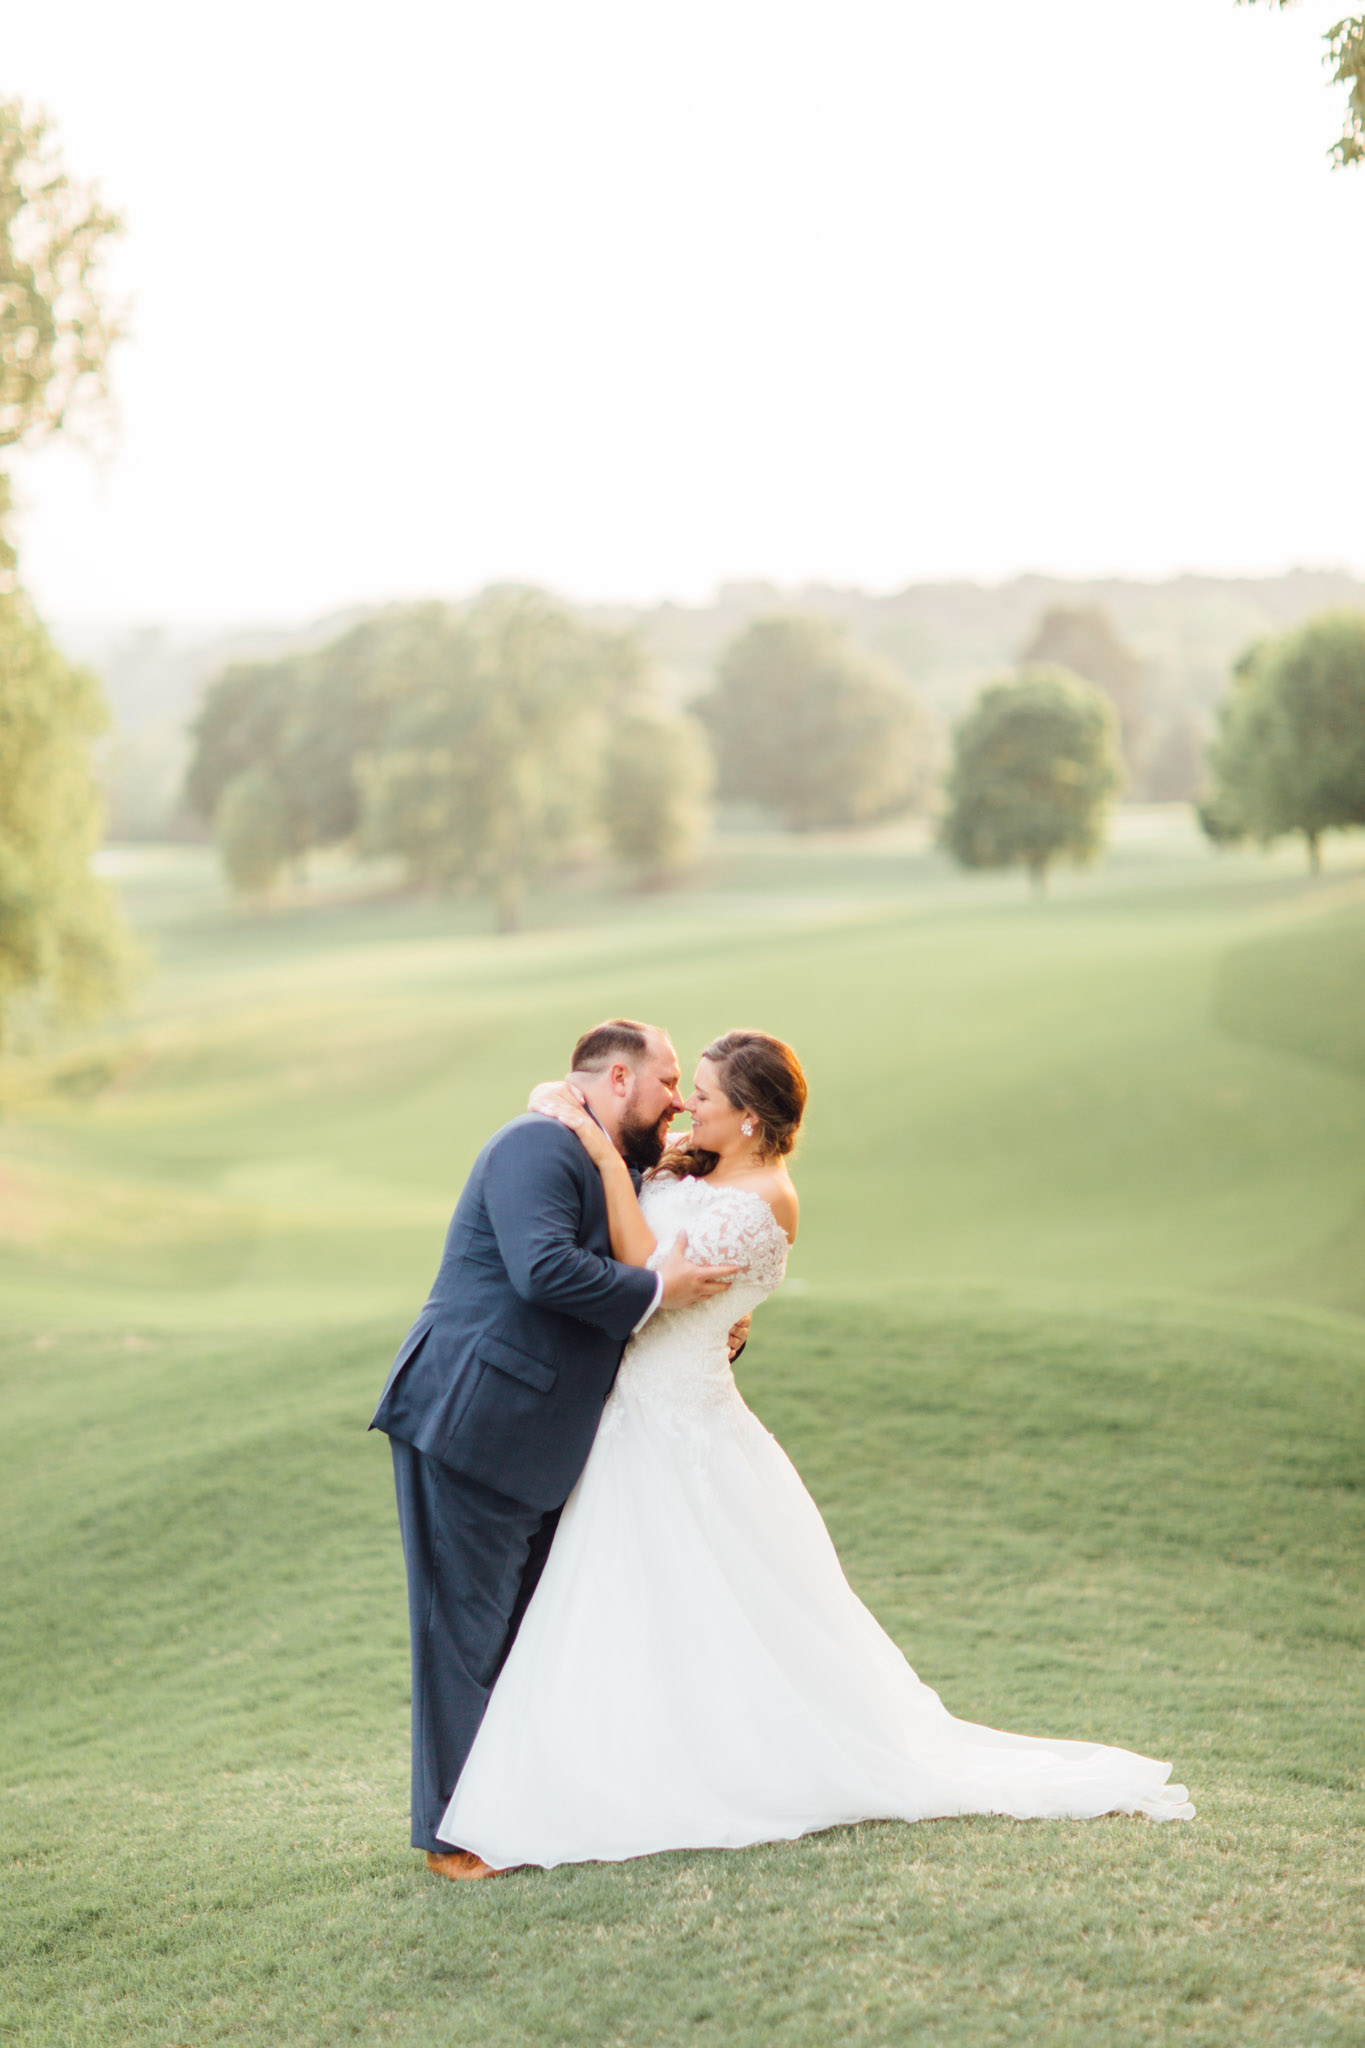 Country Club of Virginia Wedding Photographer_0101.jpg